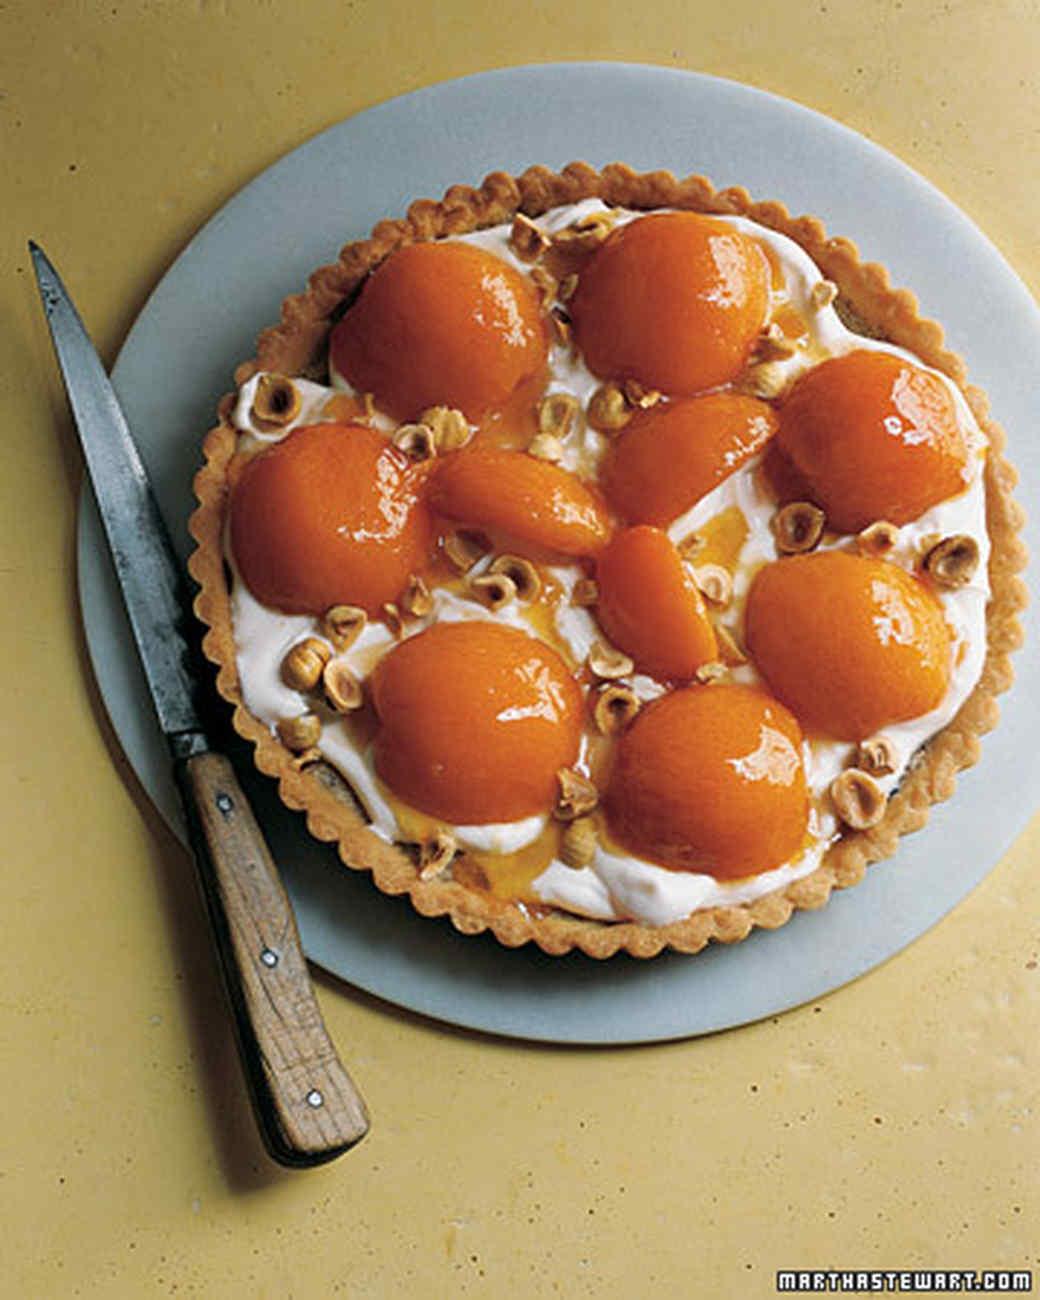 Hazelnut Frangipane Tart with Apricots and Softly Whipped Creme Fraiche